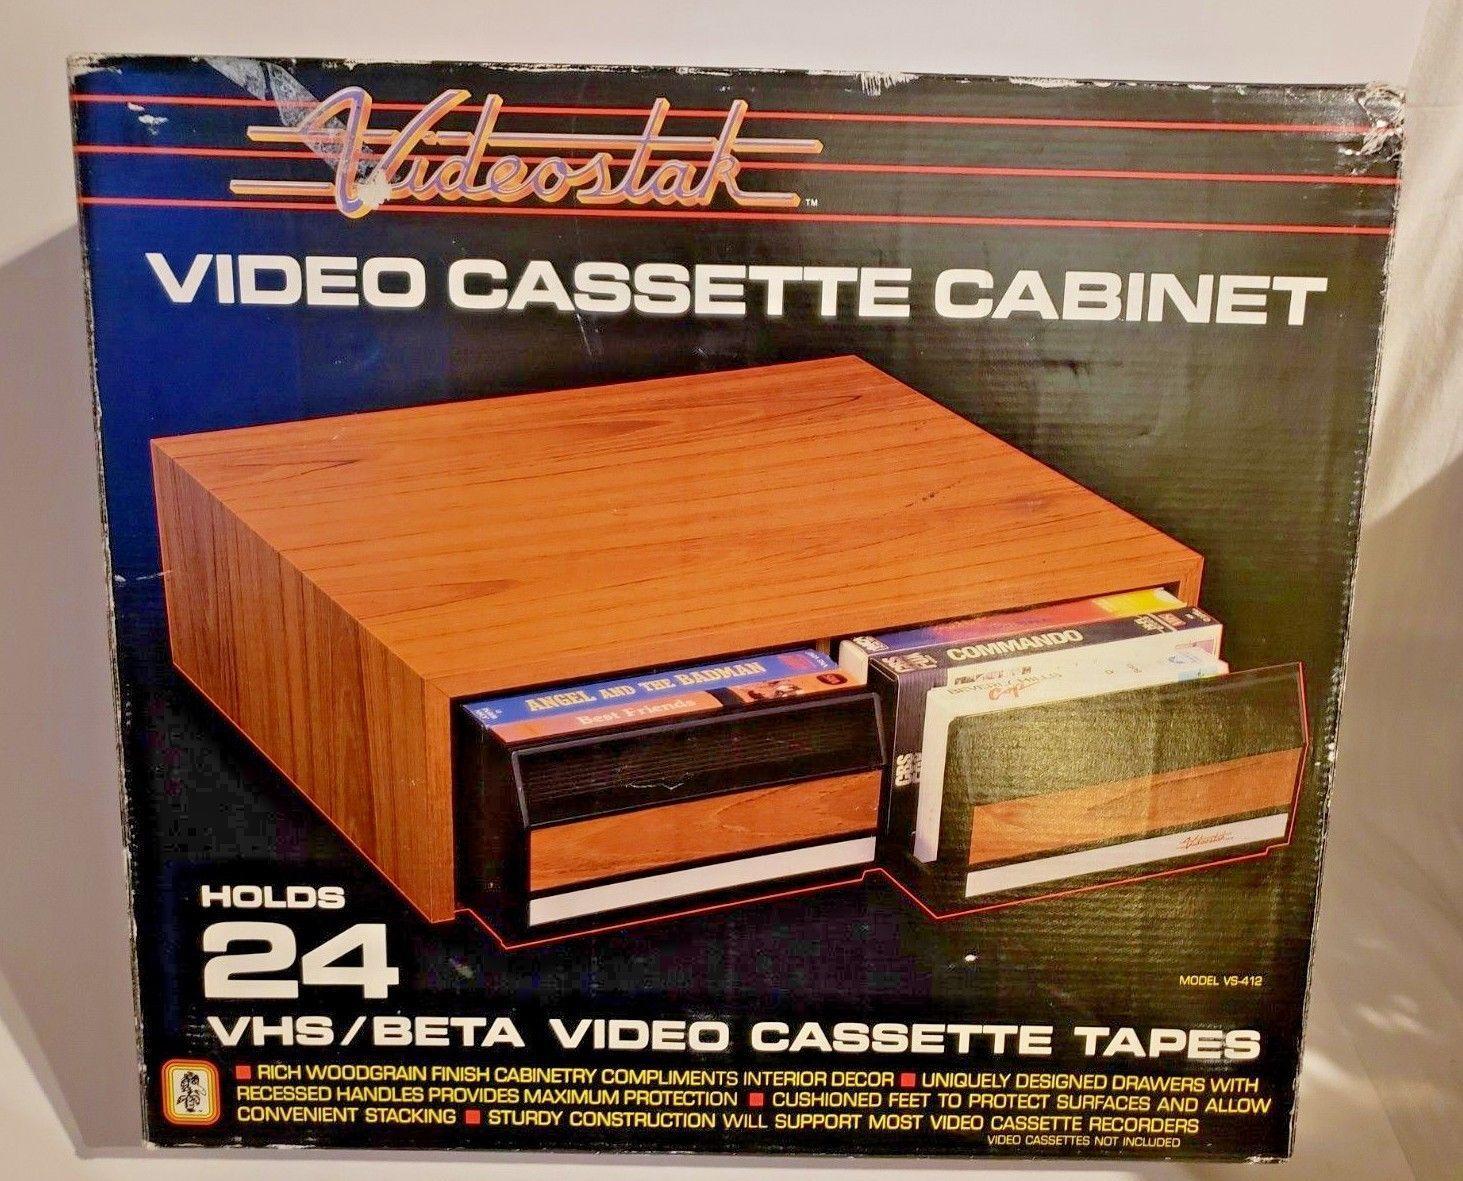 Vintage Videostak Video Cassette Cabinet Holds 24 VHS Tapes..In Original Box